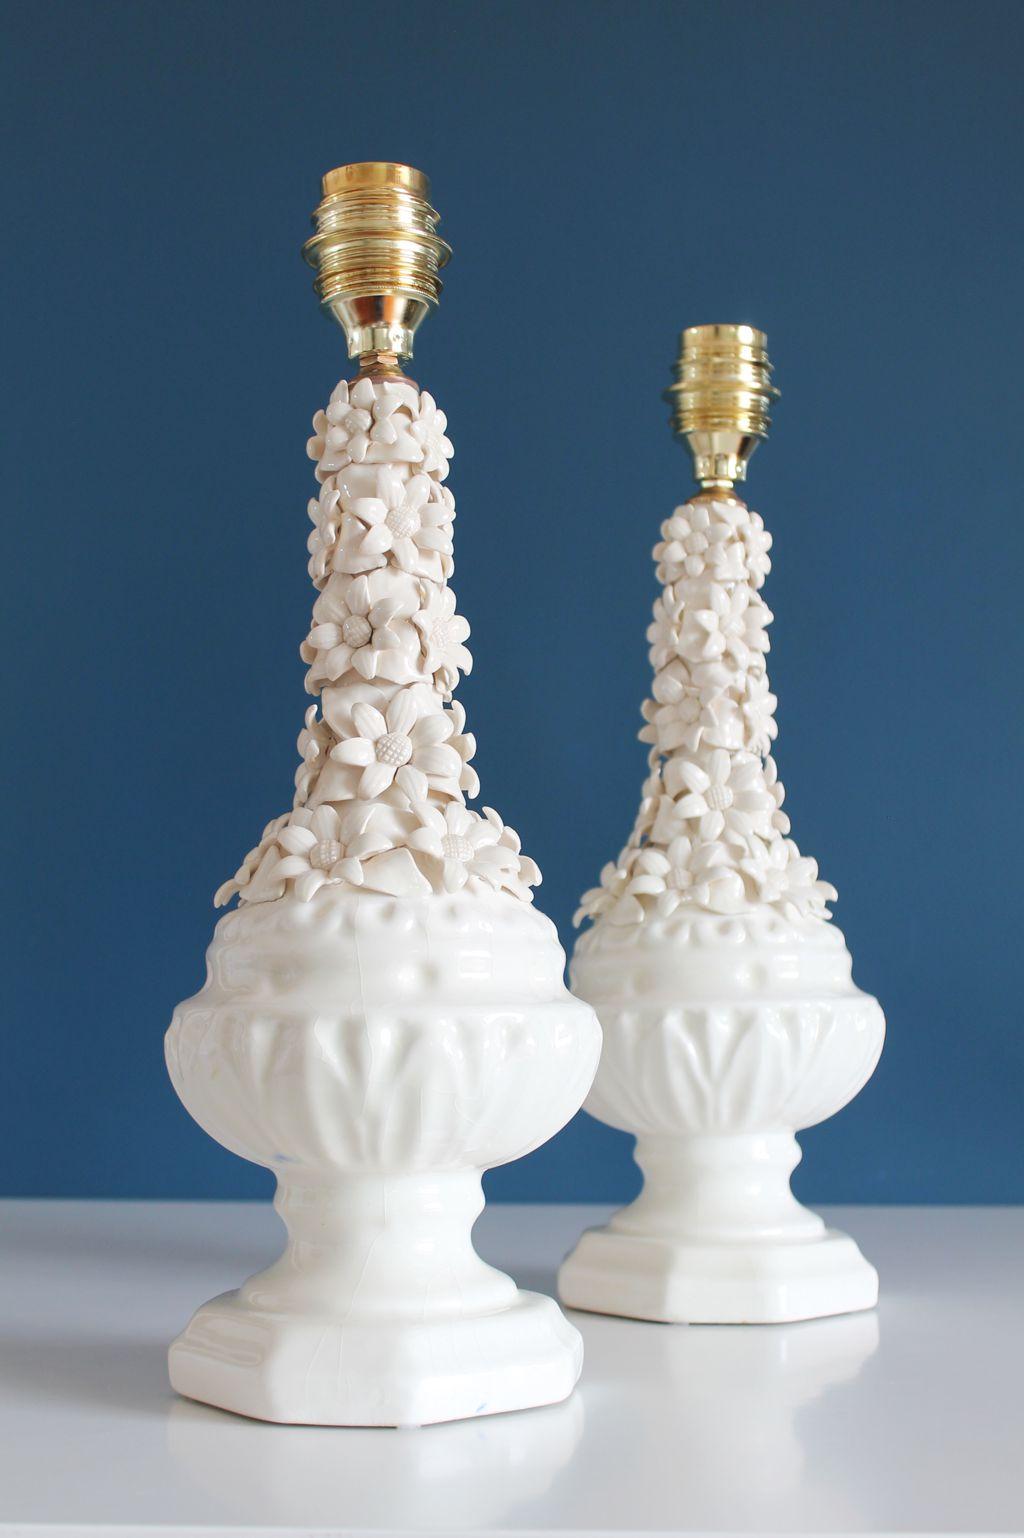 Pareja de l mparas de cer mica blanca de manises vintage for Lamparas de ceramica